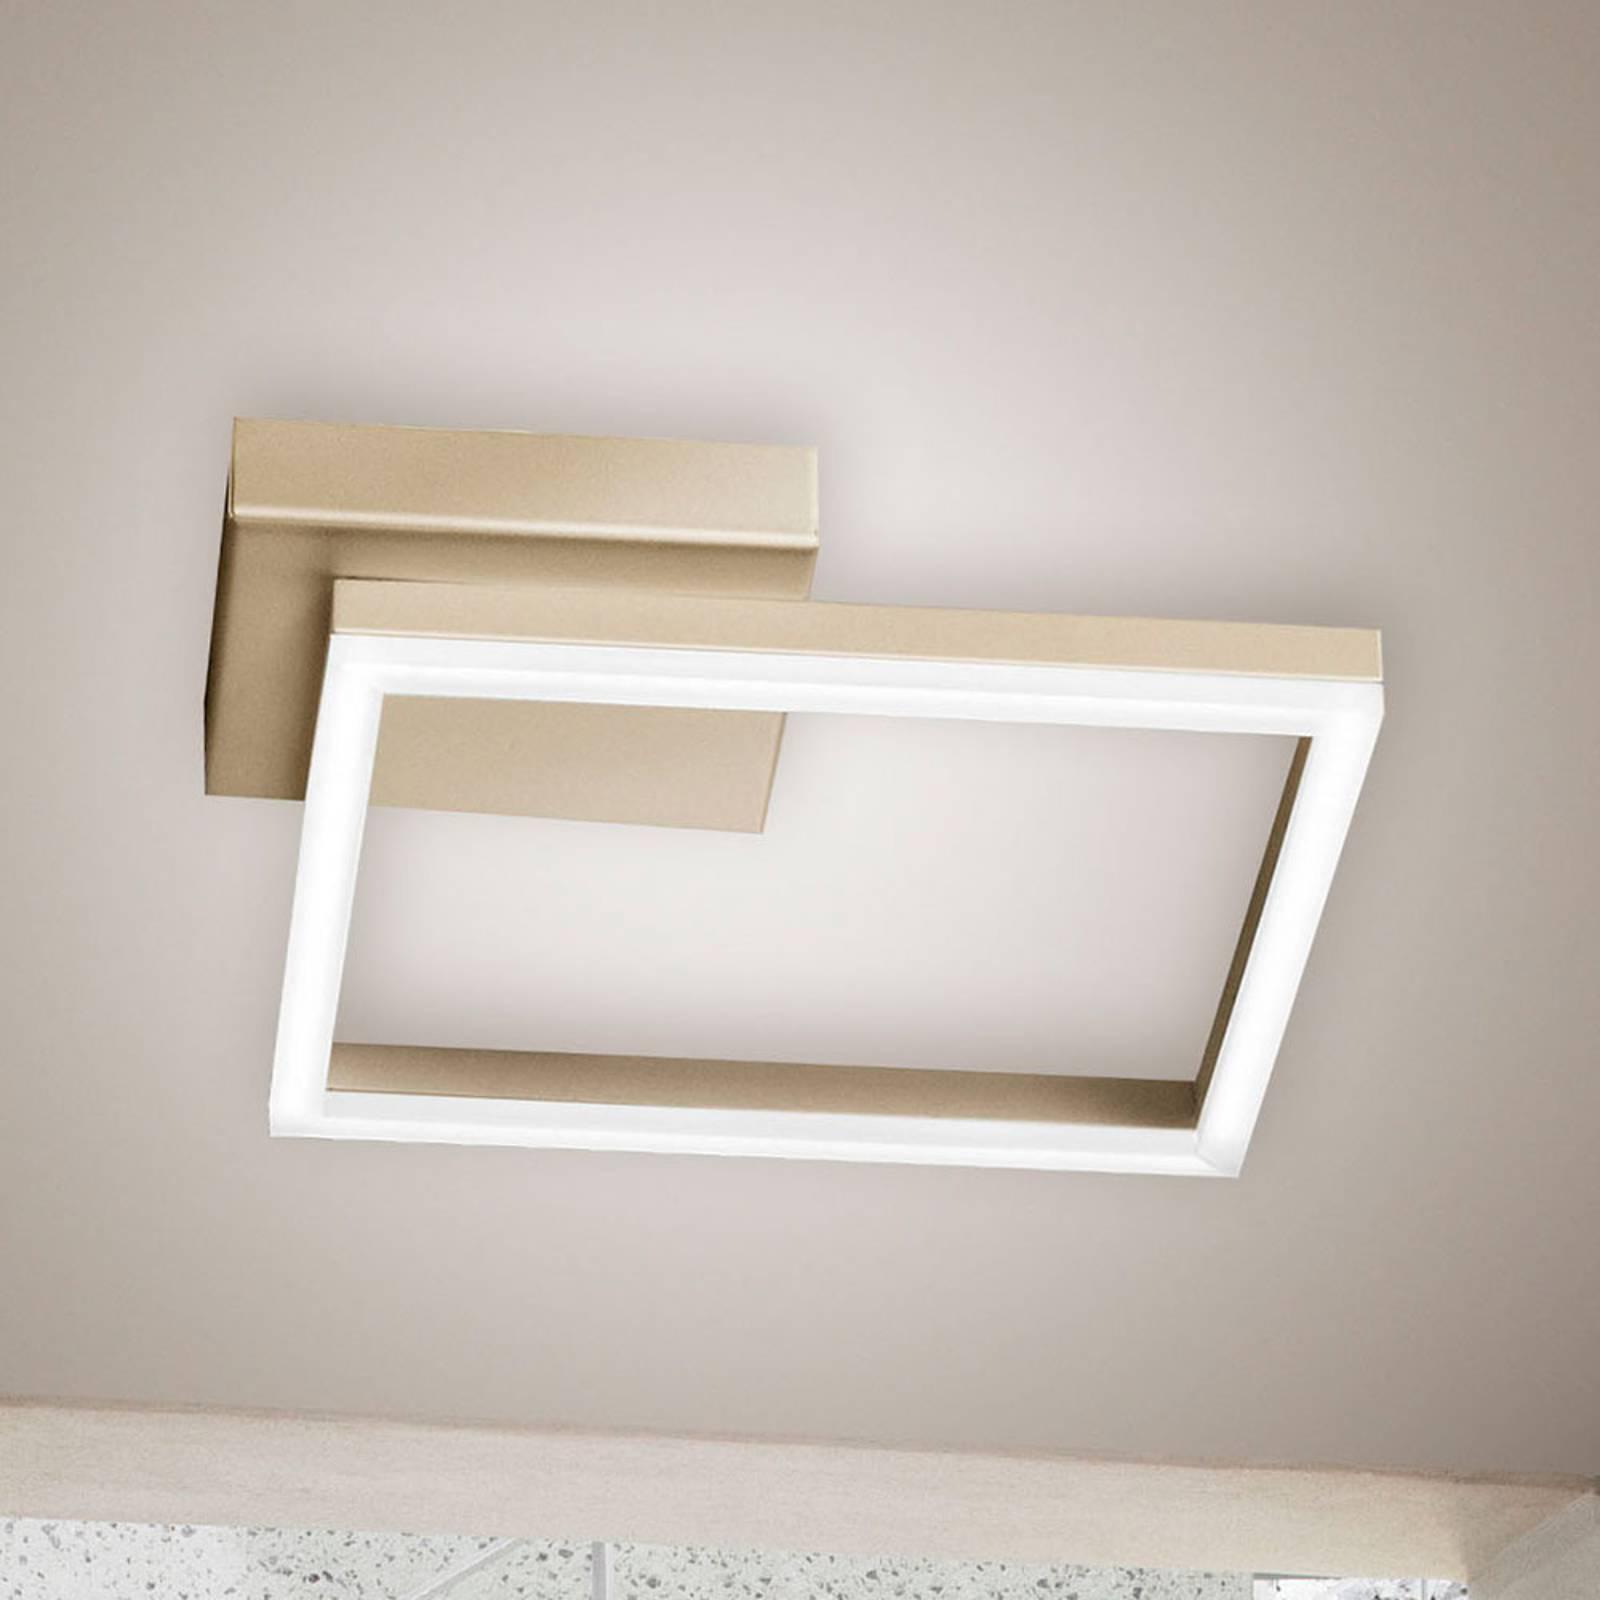 LED-kattovalaisin Bard, 27 x 27 cm, mattakulta